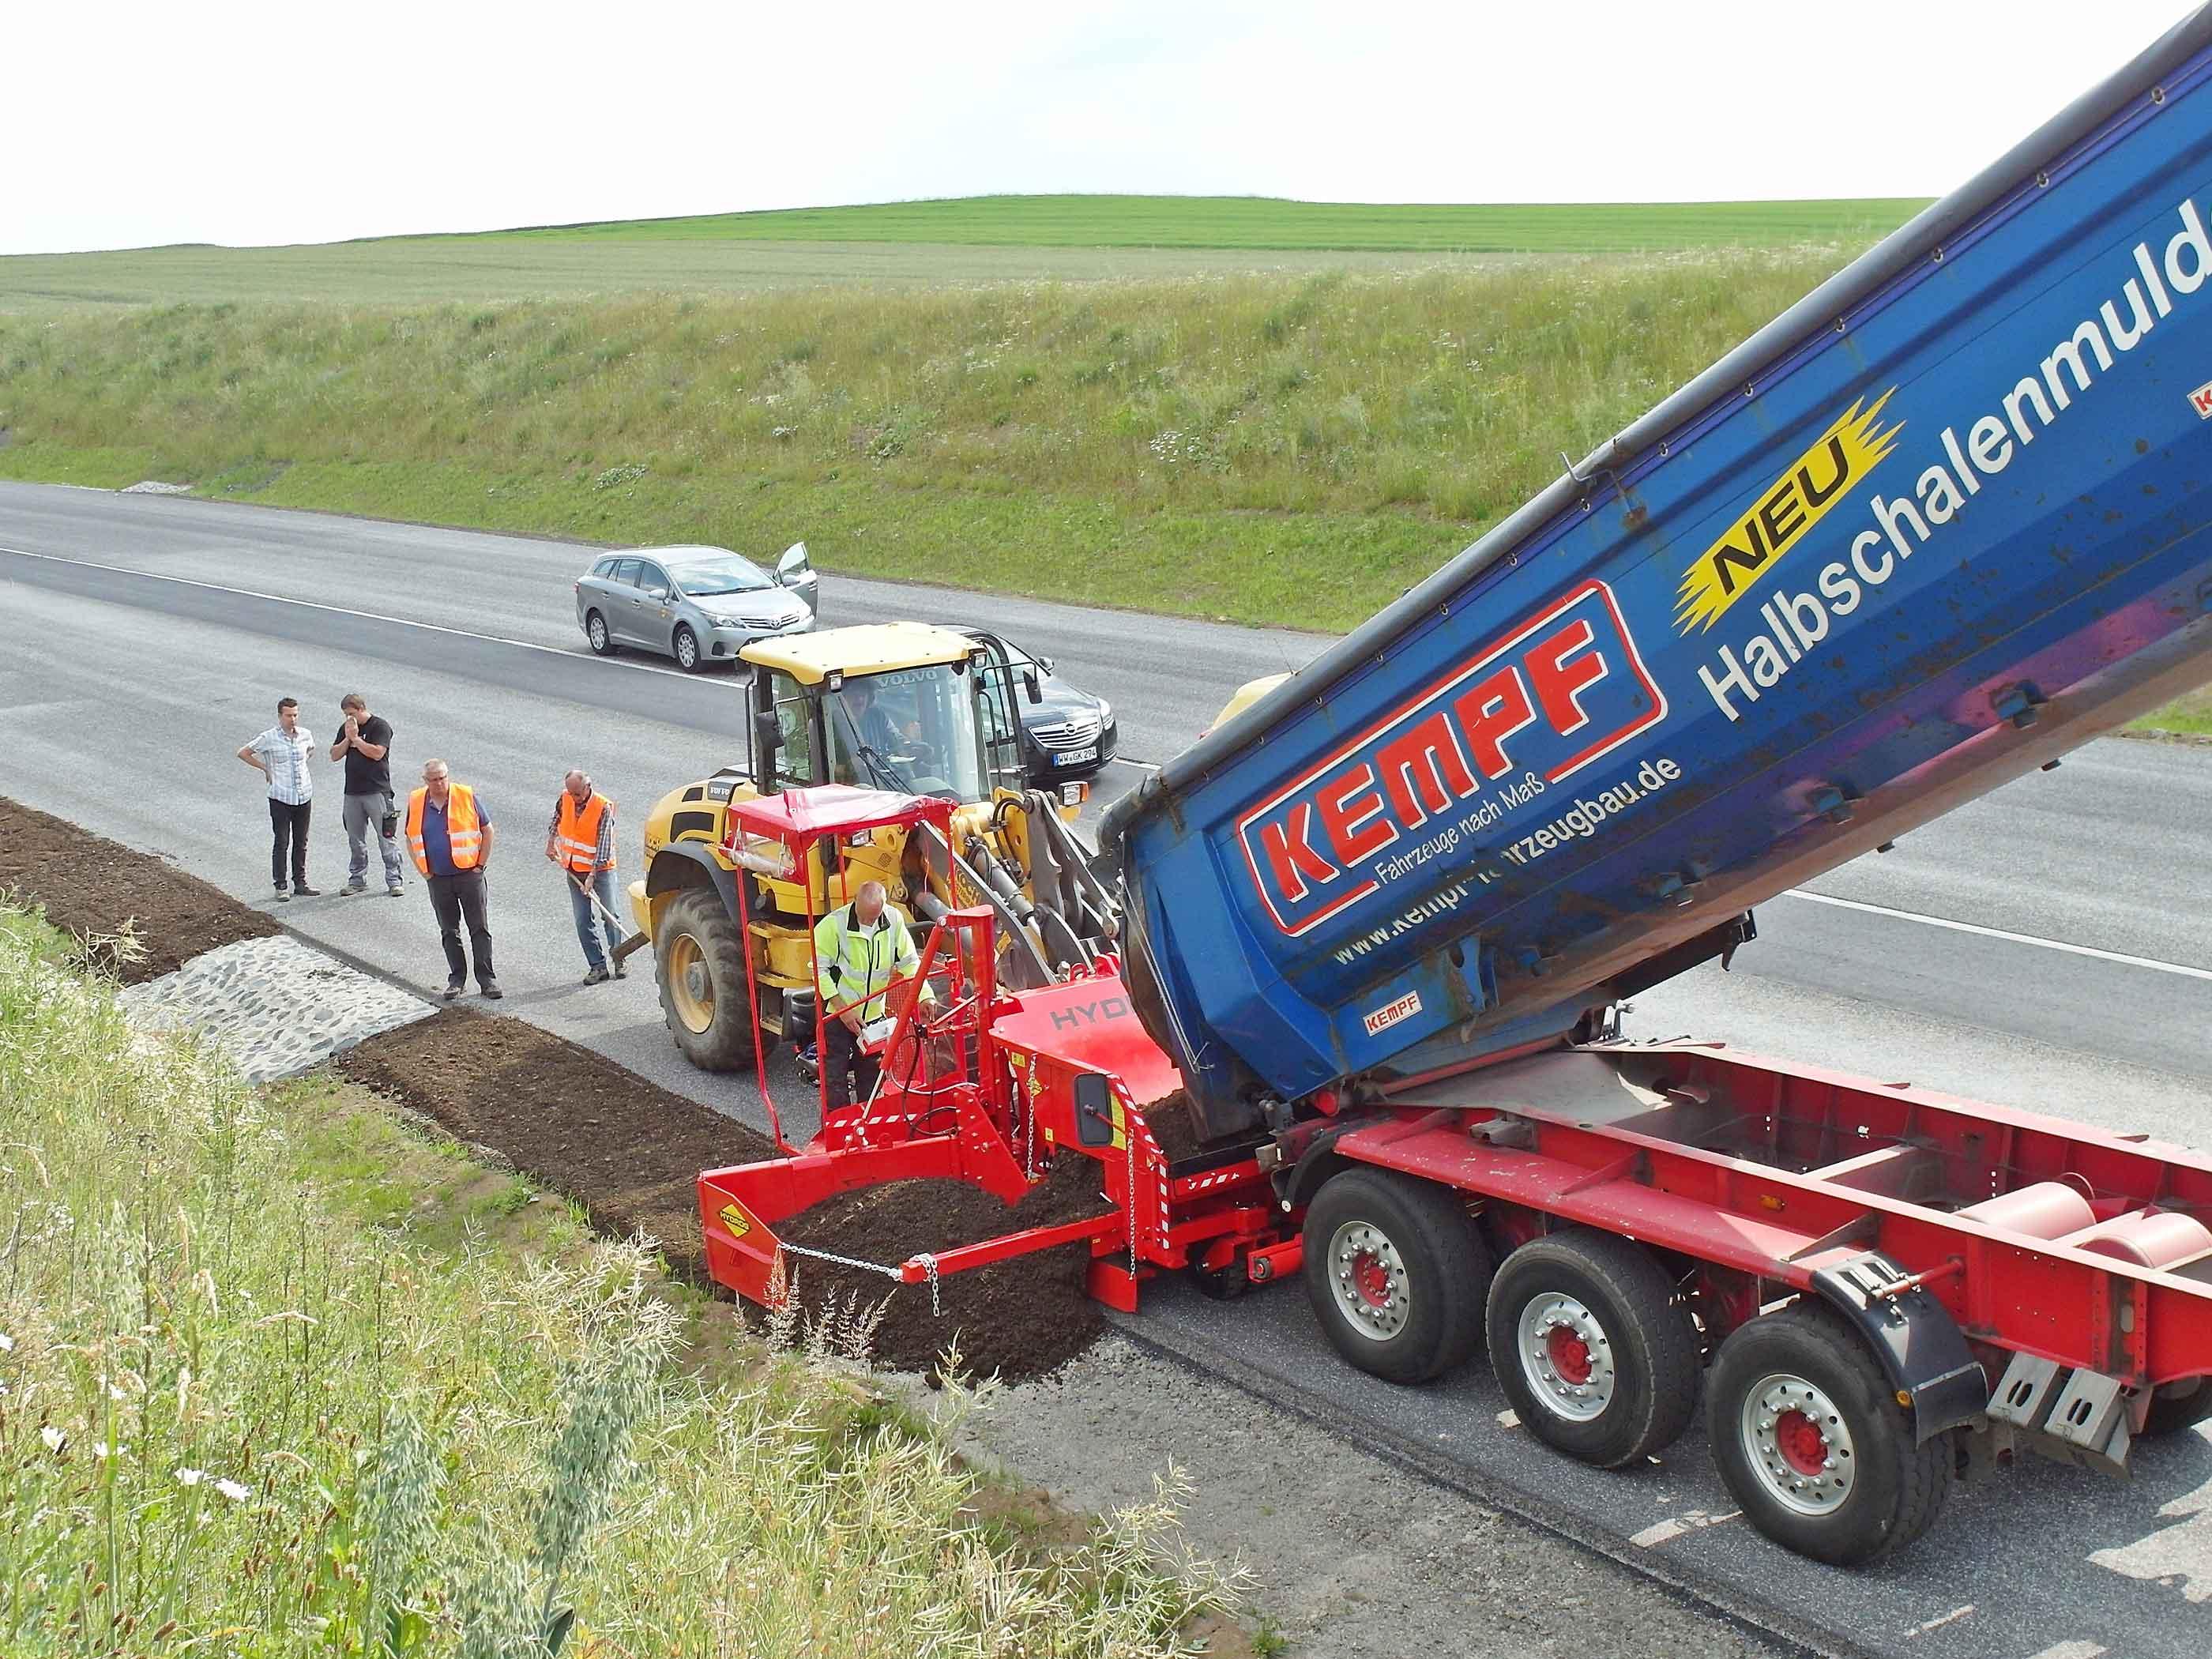 Echipamente, utilaje si masini pentru Constructie, intretinere si reparatii de drumuri